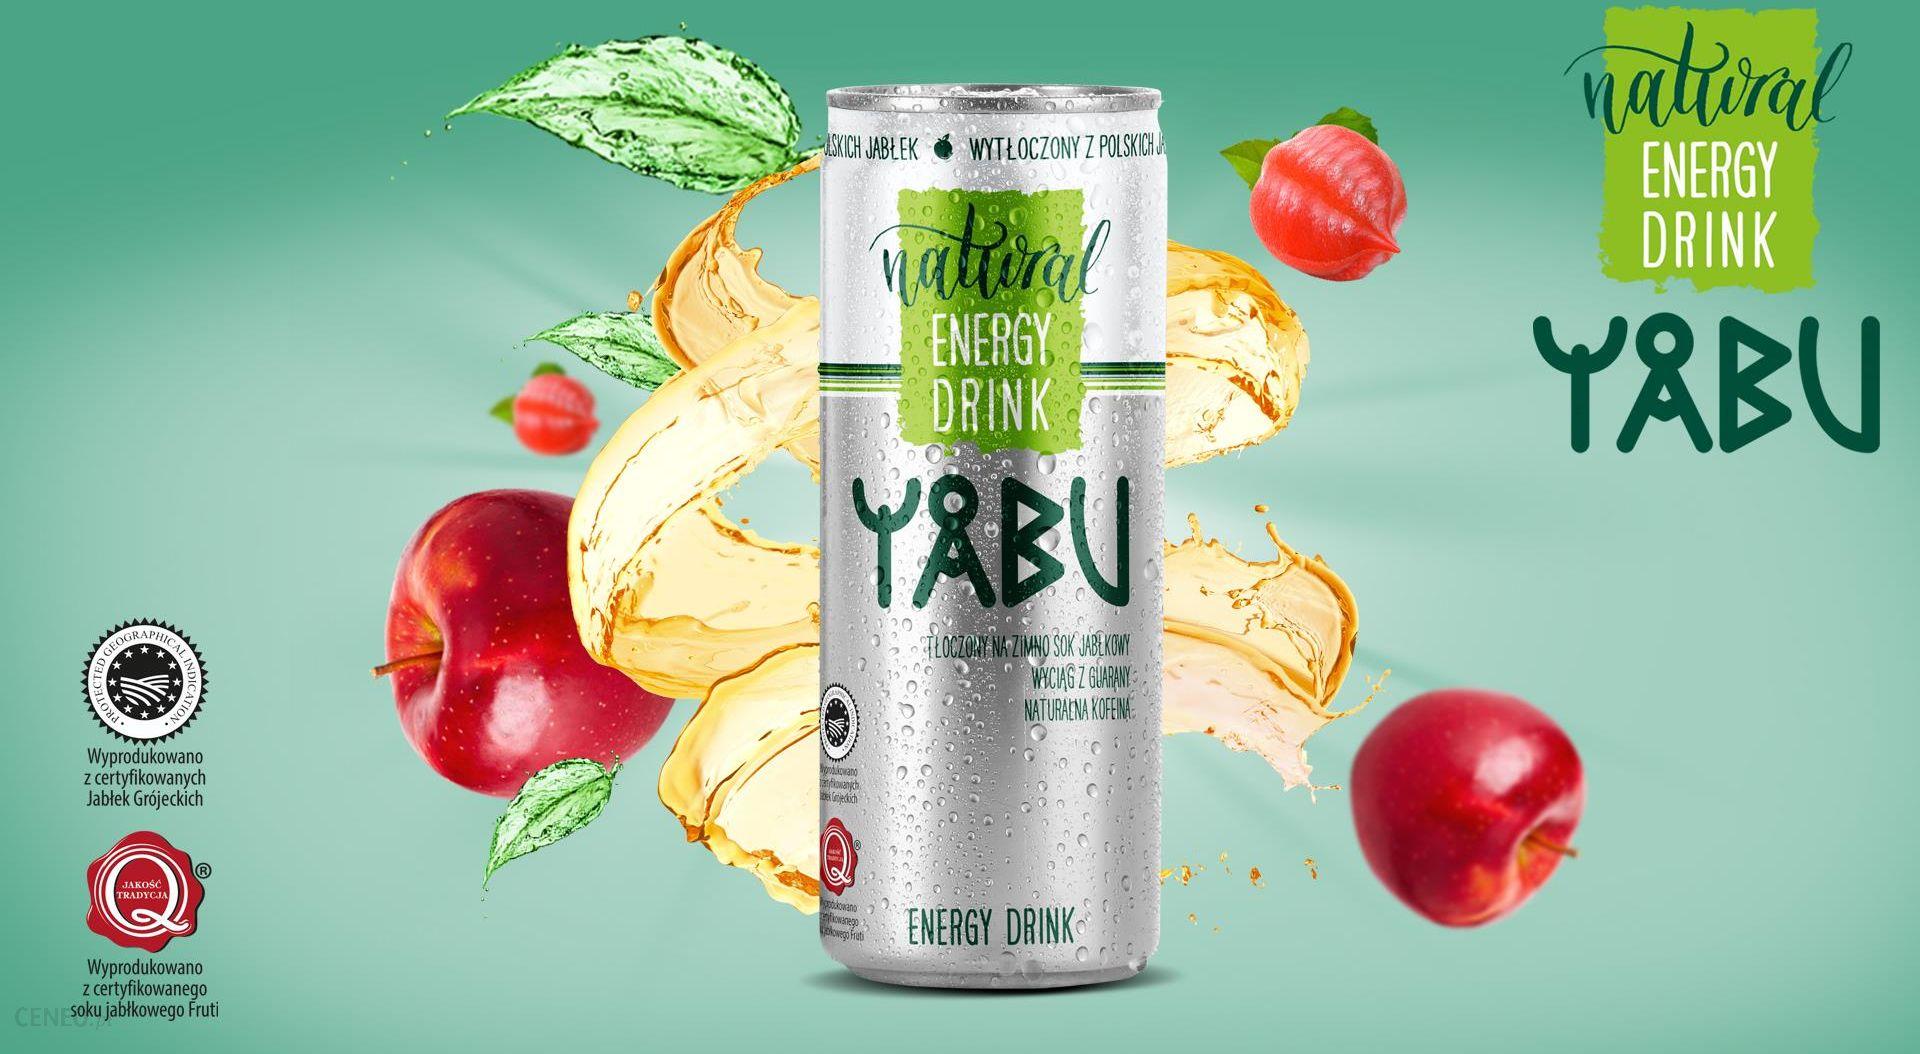 i-yabu-natural-energy-drink-250ml.jpg